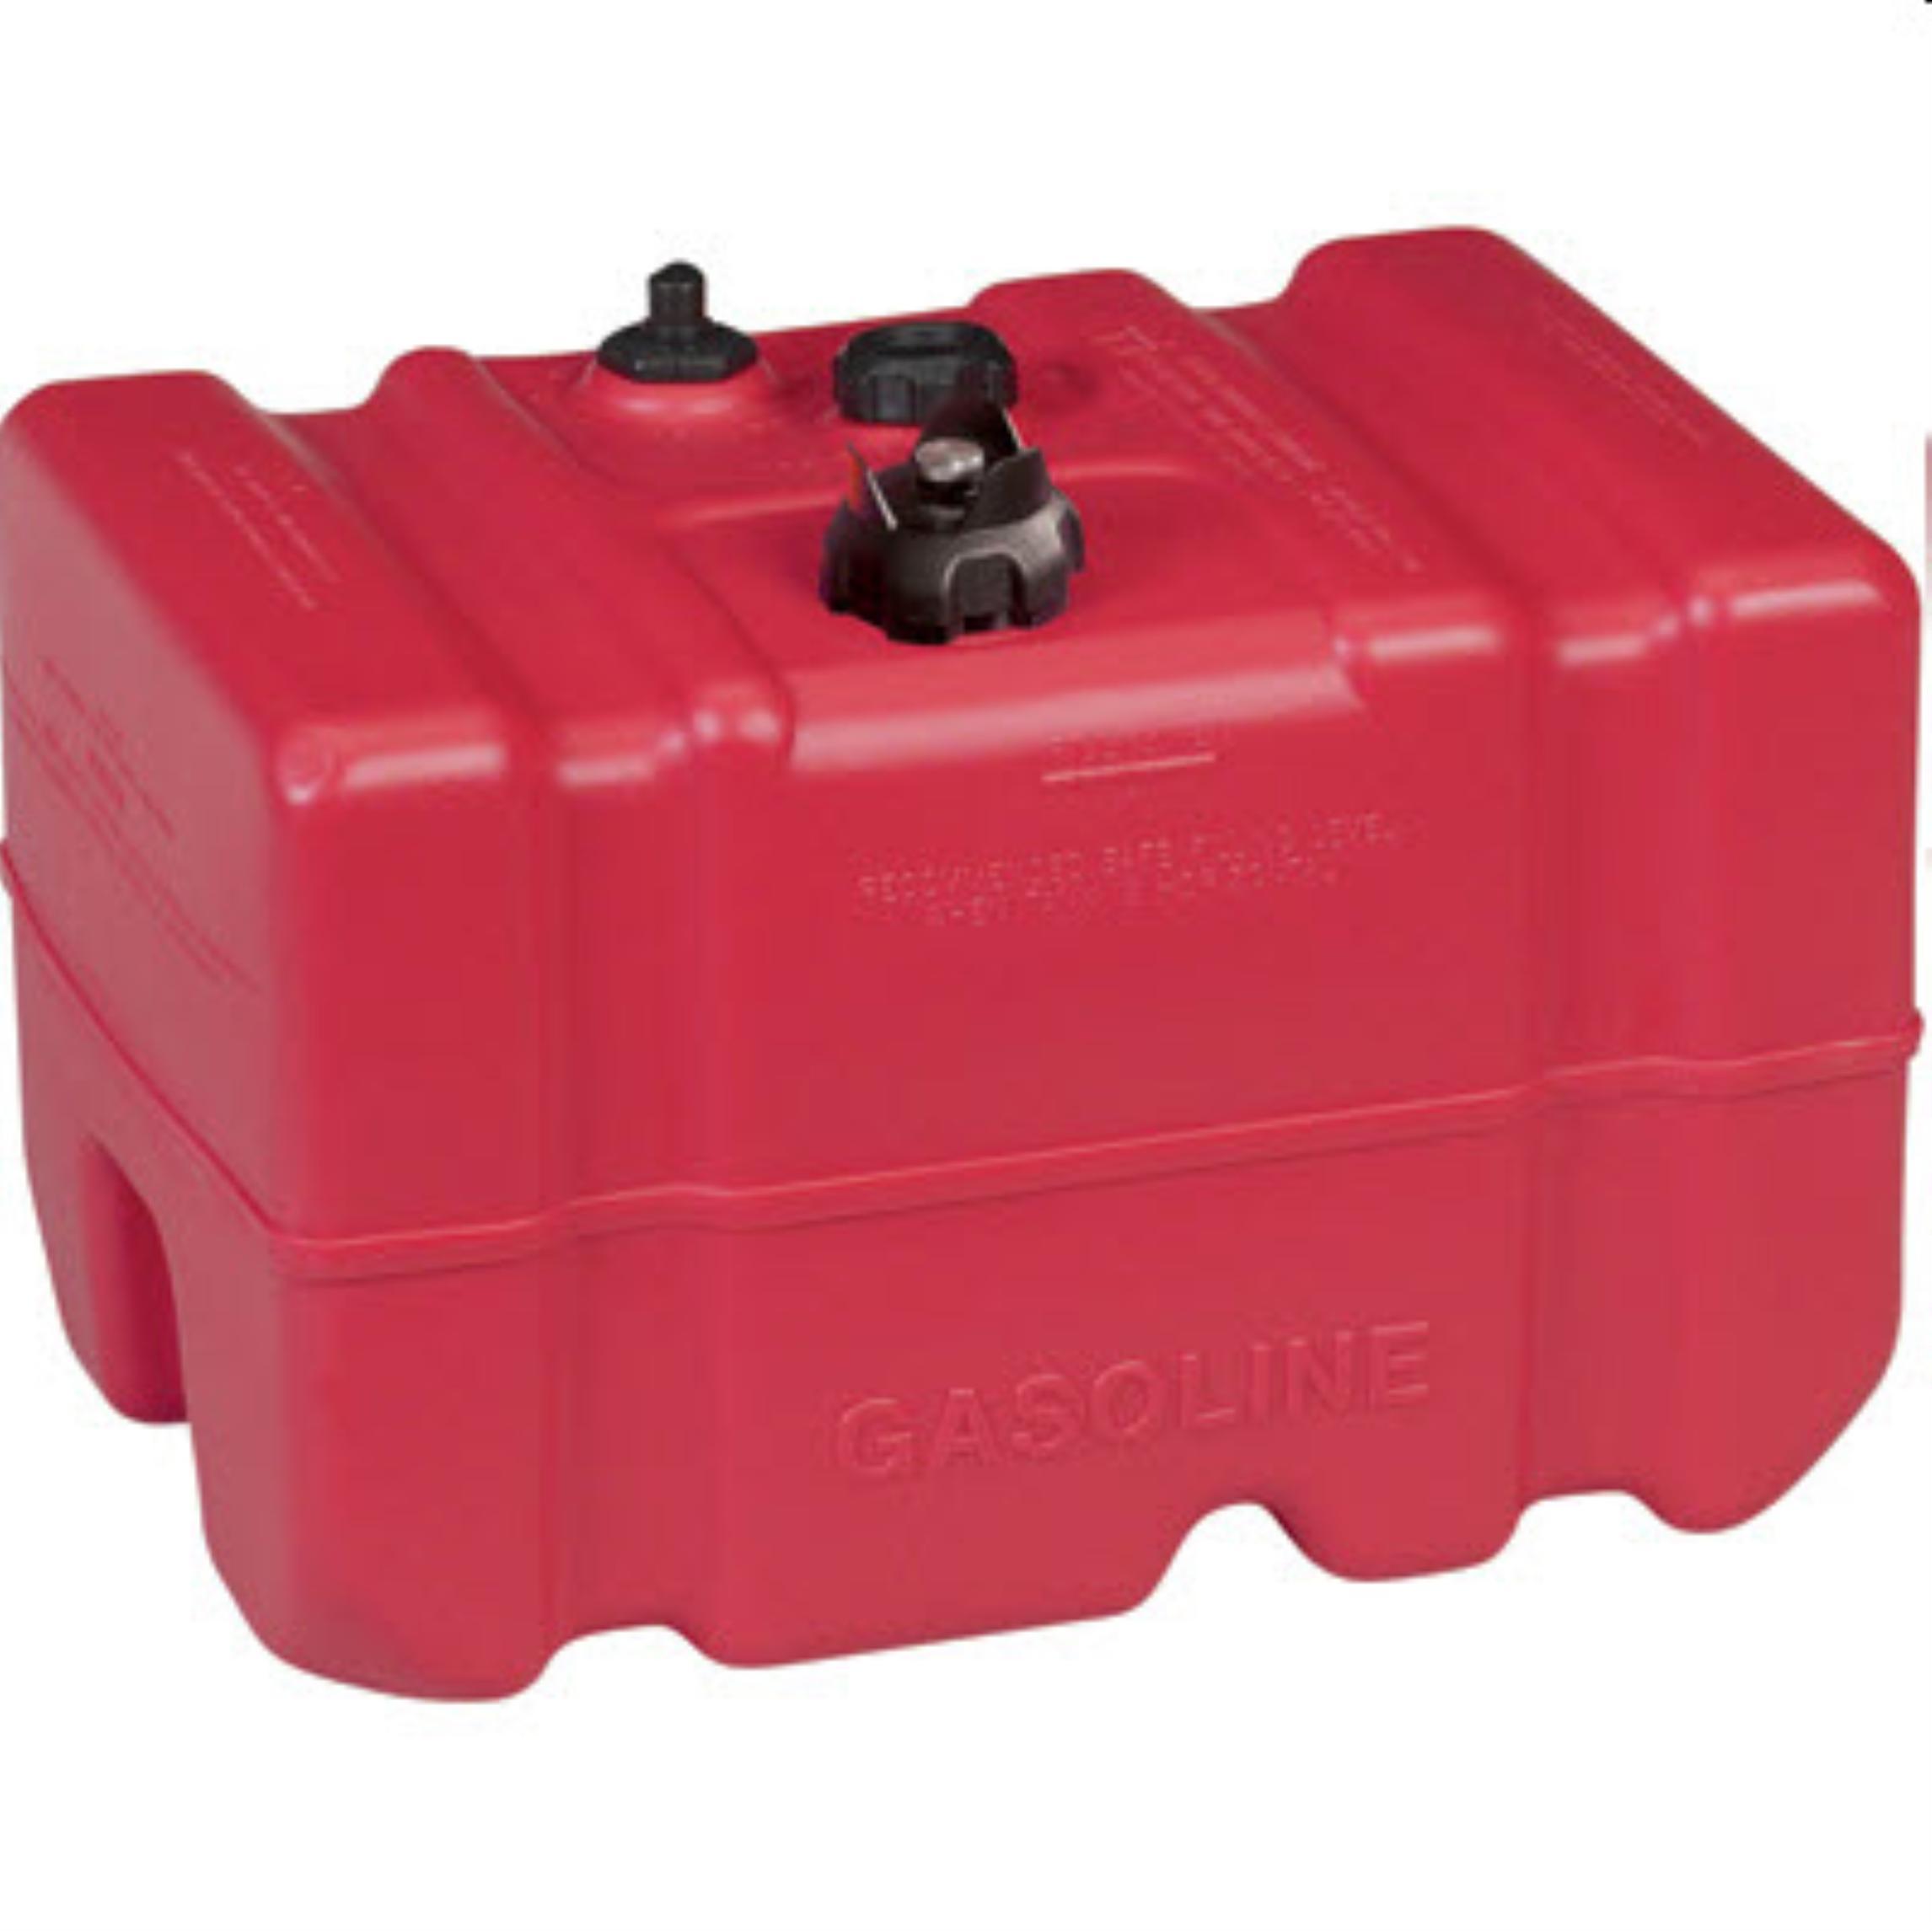 Moeller 630012lp Marine Epa Compliant Topside Fuel Tank